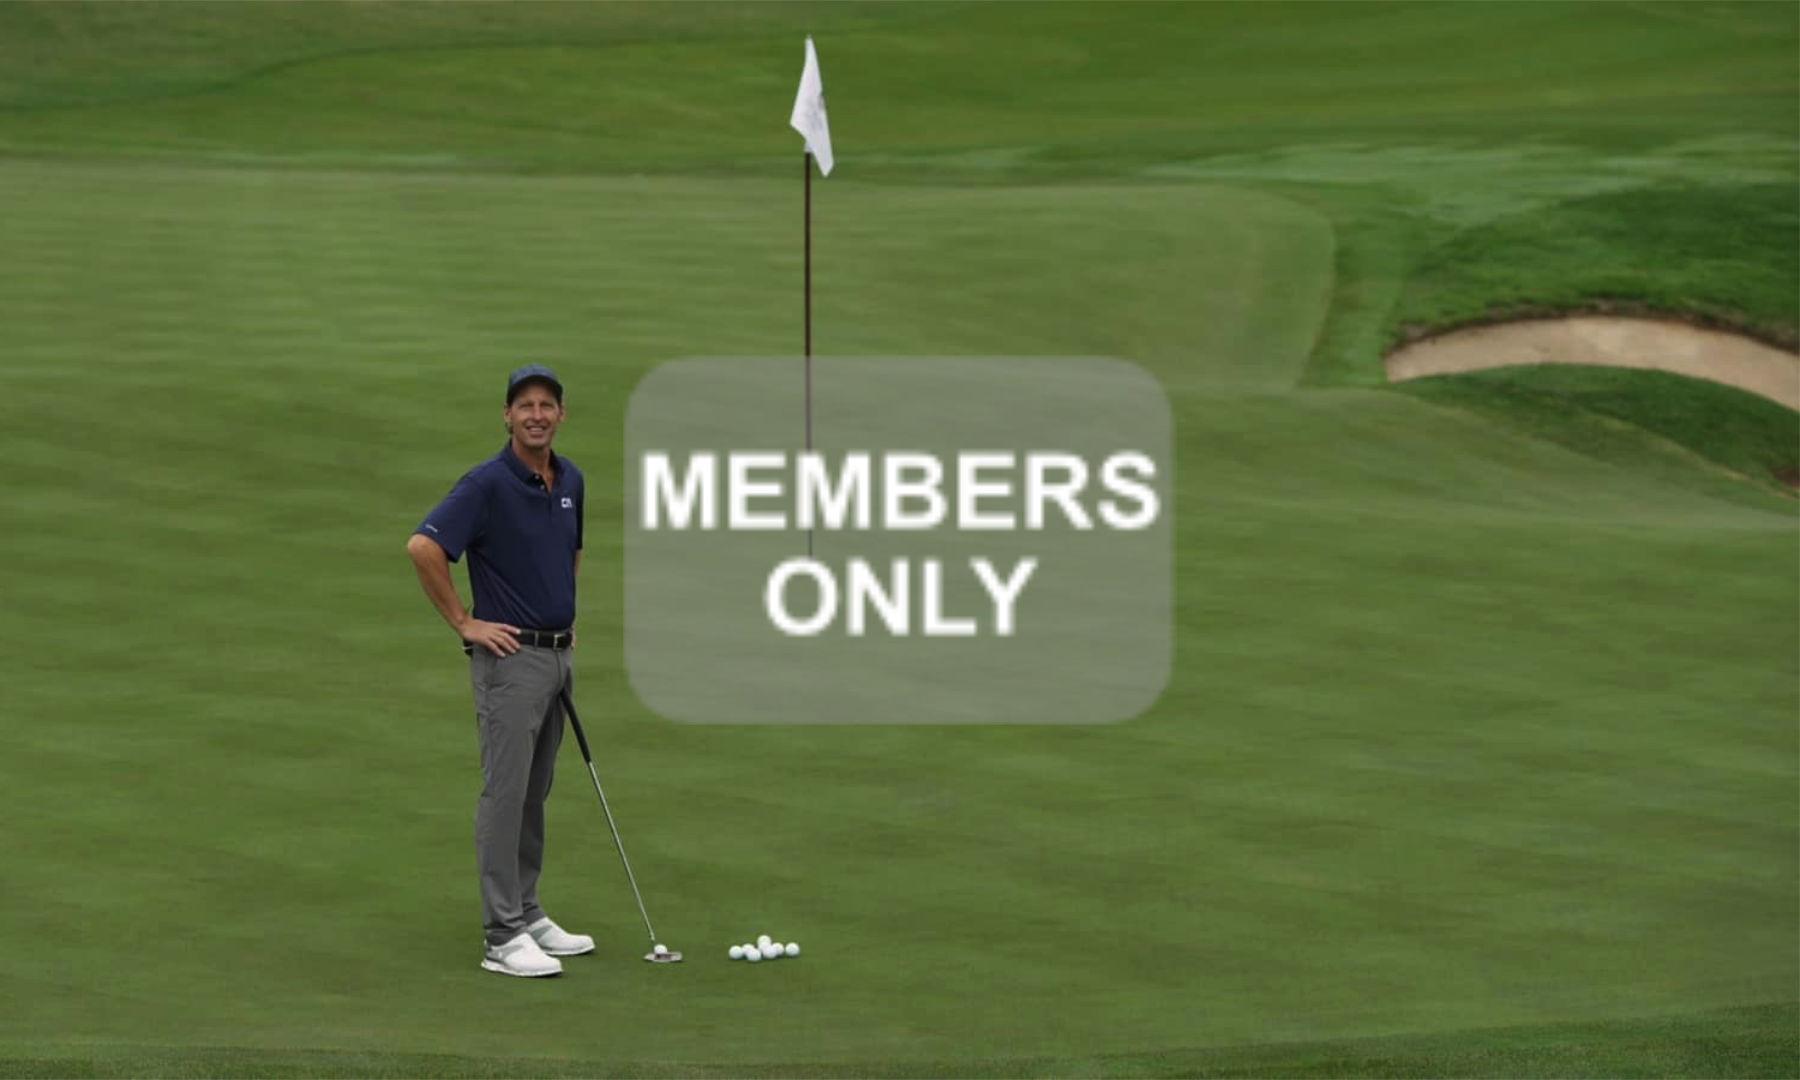 Golf lernen Videoportal – Golf spielen lernen – Putten - Golftechnik